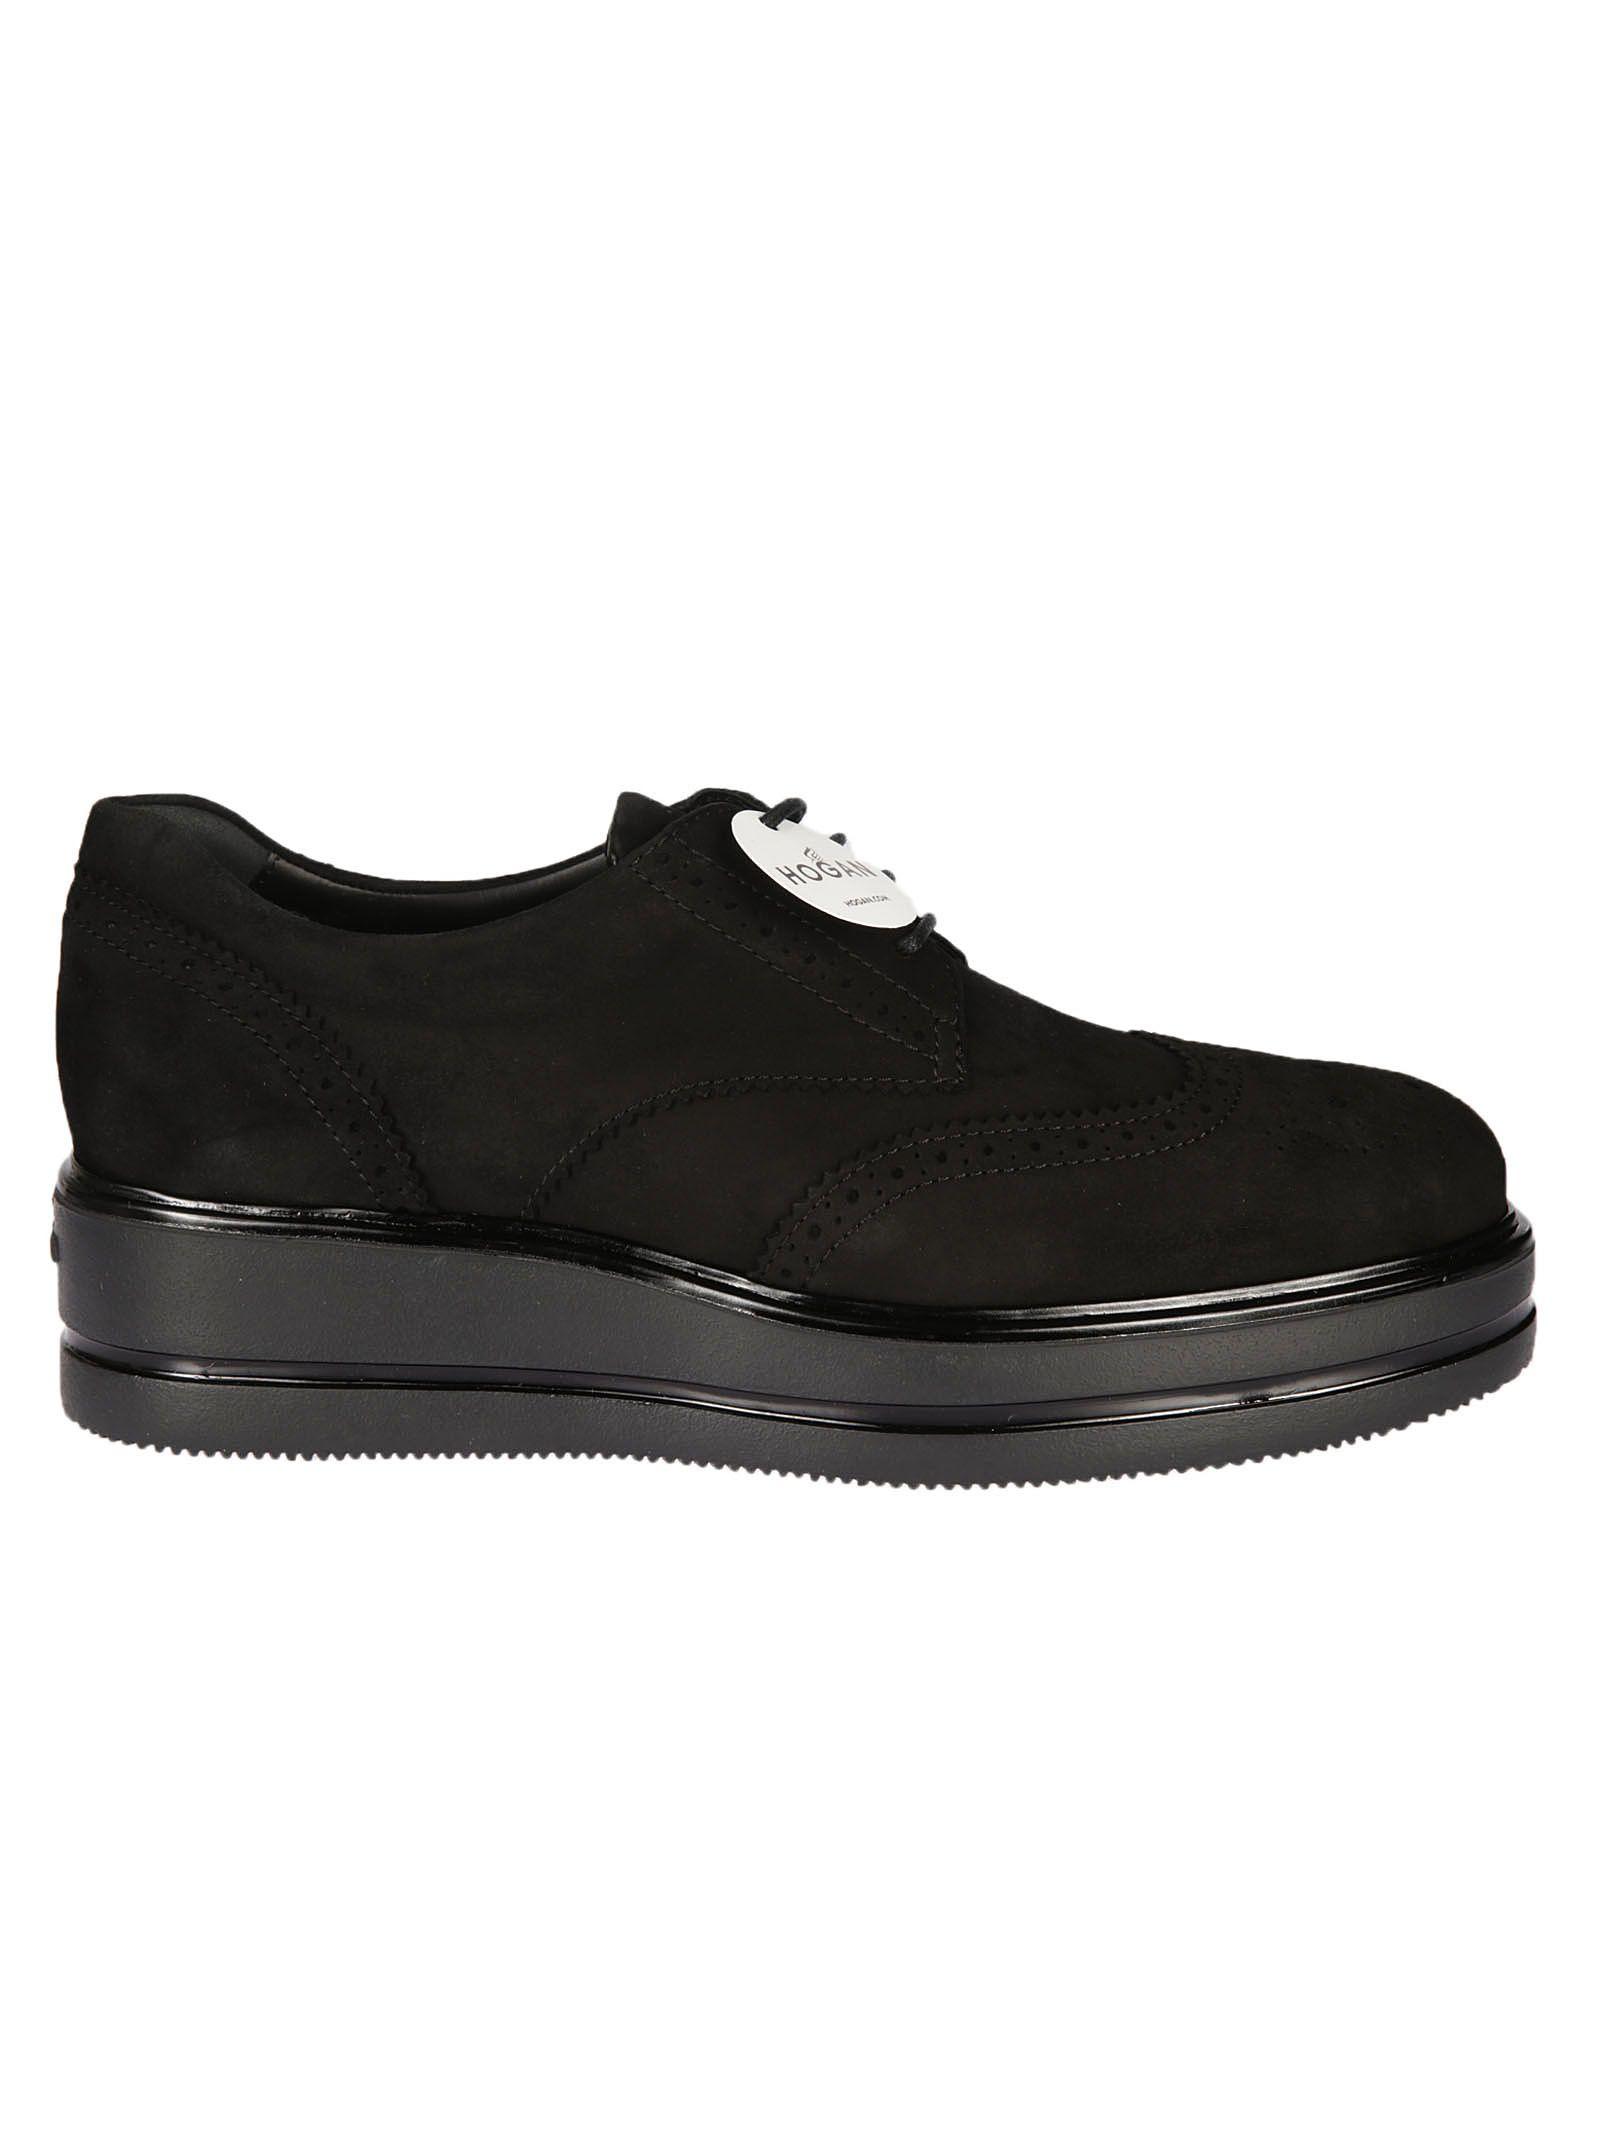 Hogan Brogue Platform Lace-up Shoes